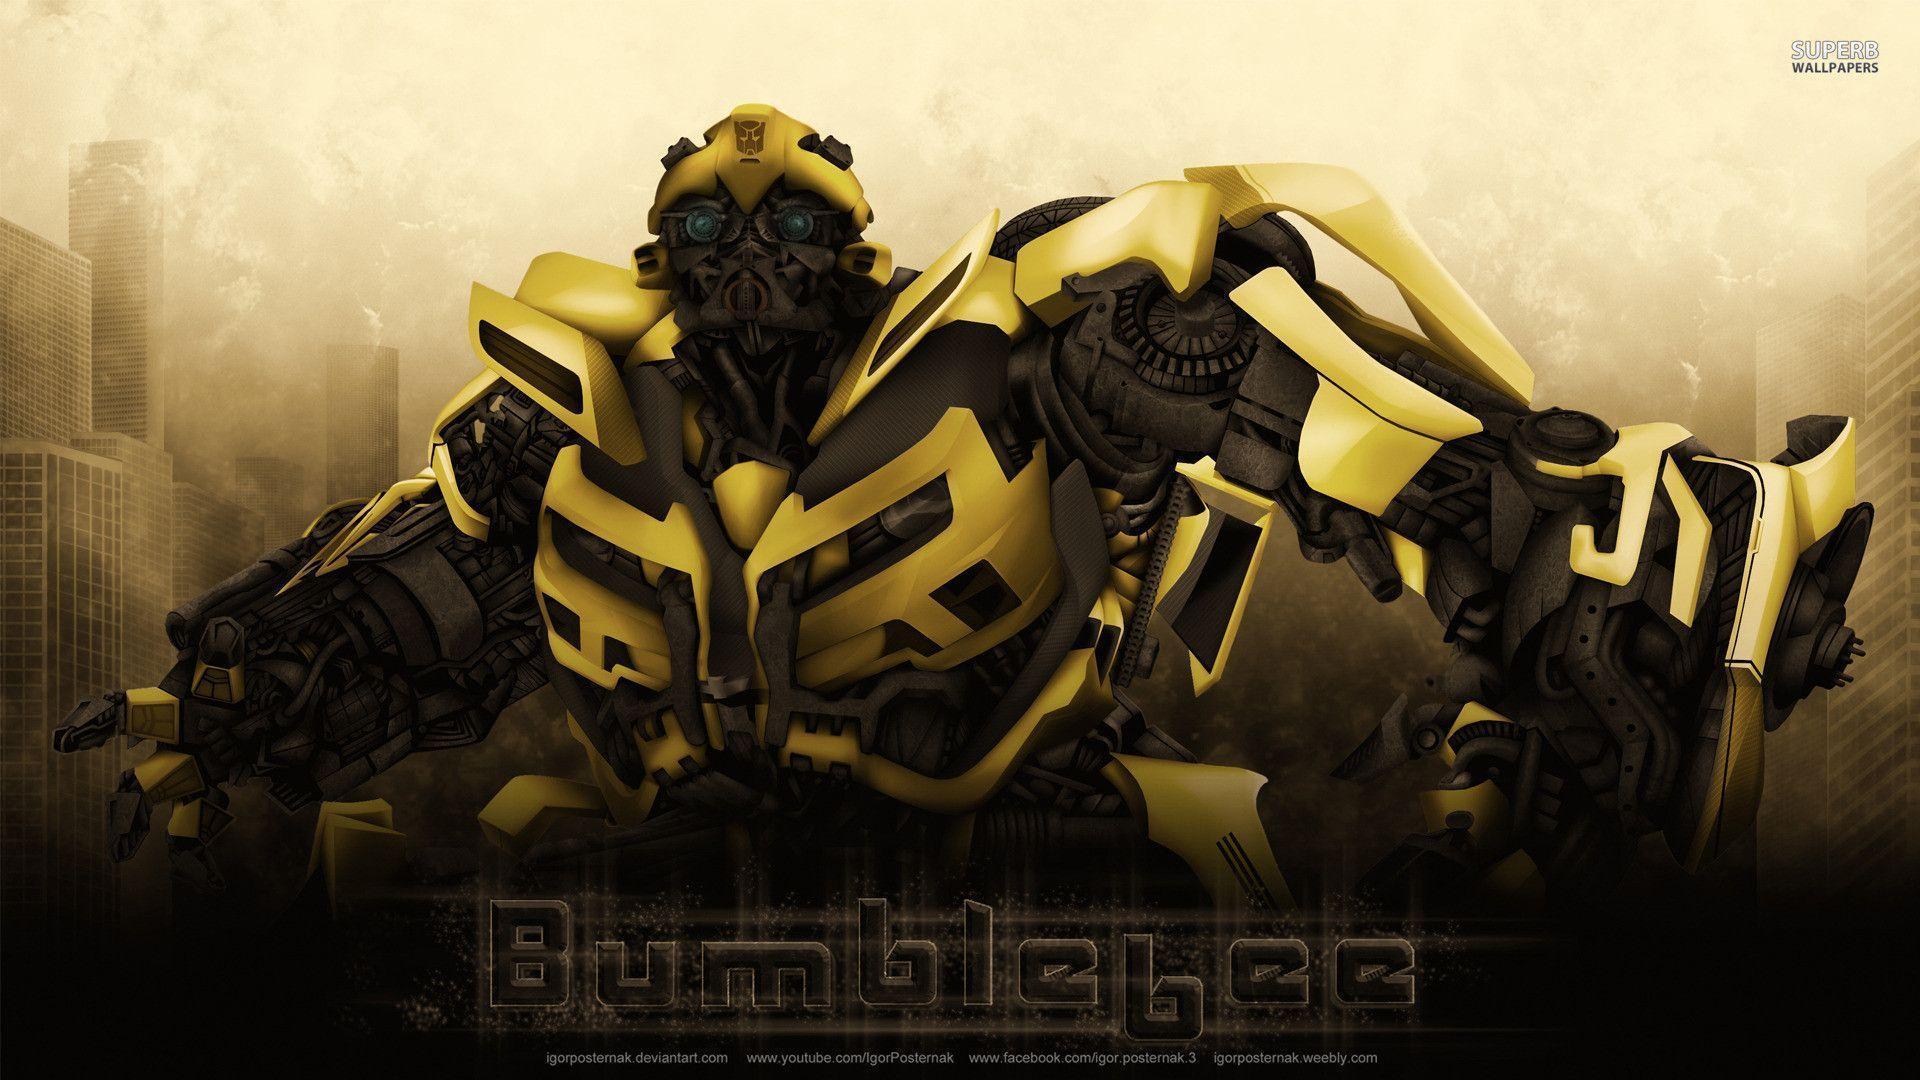 Wallpapers transformers bumblebee wallpaper cave - Transformers bumblebee car wallpaper ...